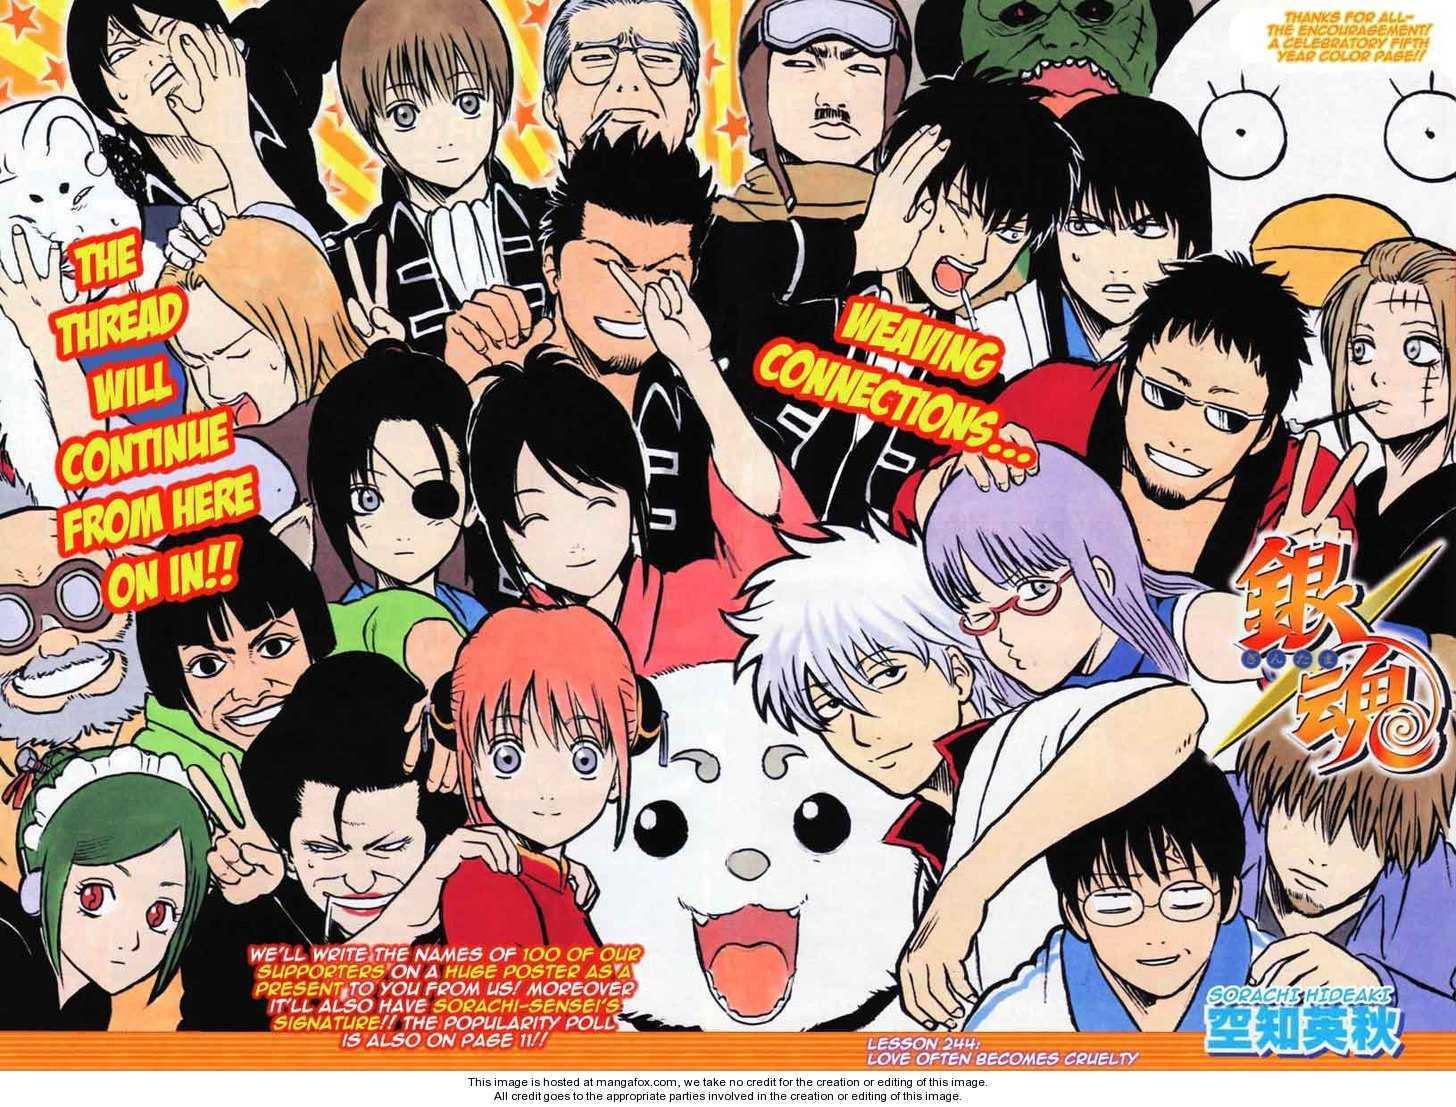 https://im.nineanime.com/comics/pic9/18/210/16898/Gintama2441138.jpg Page 2